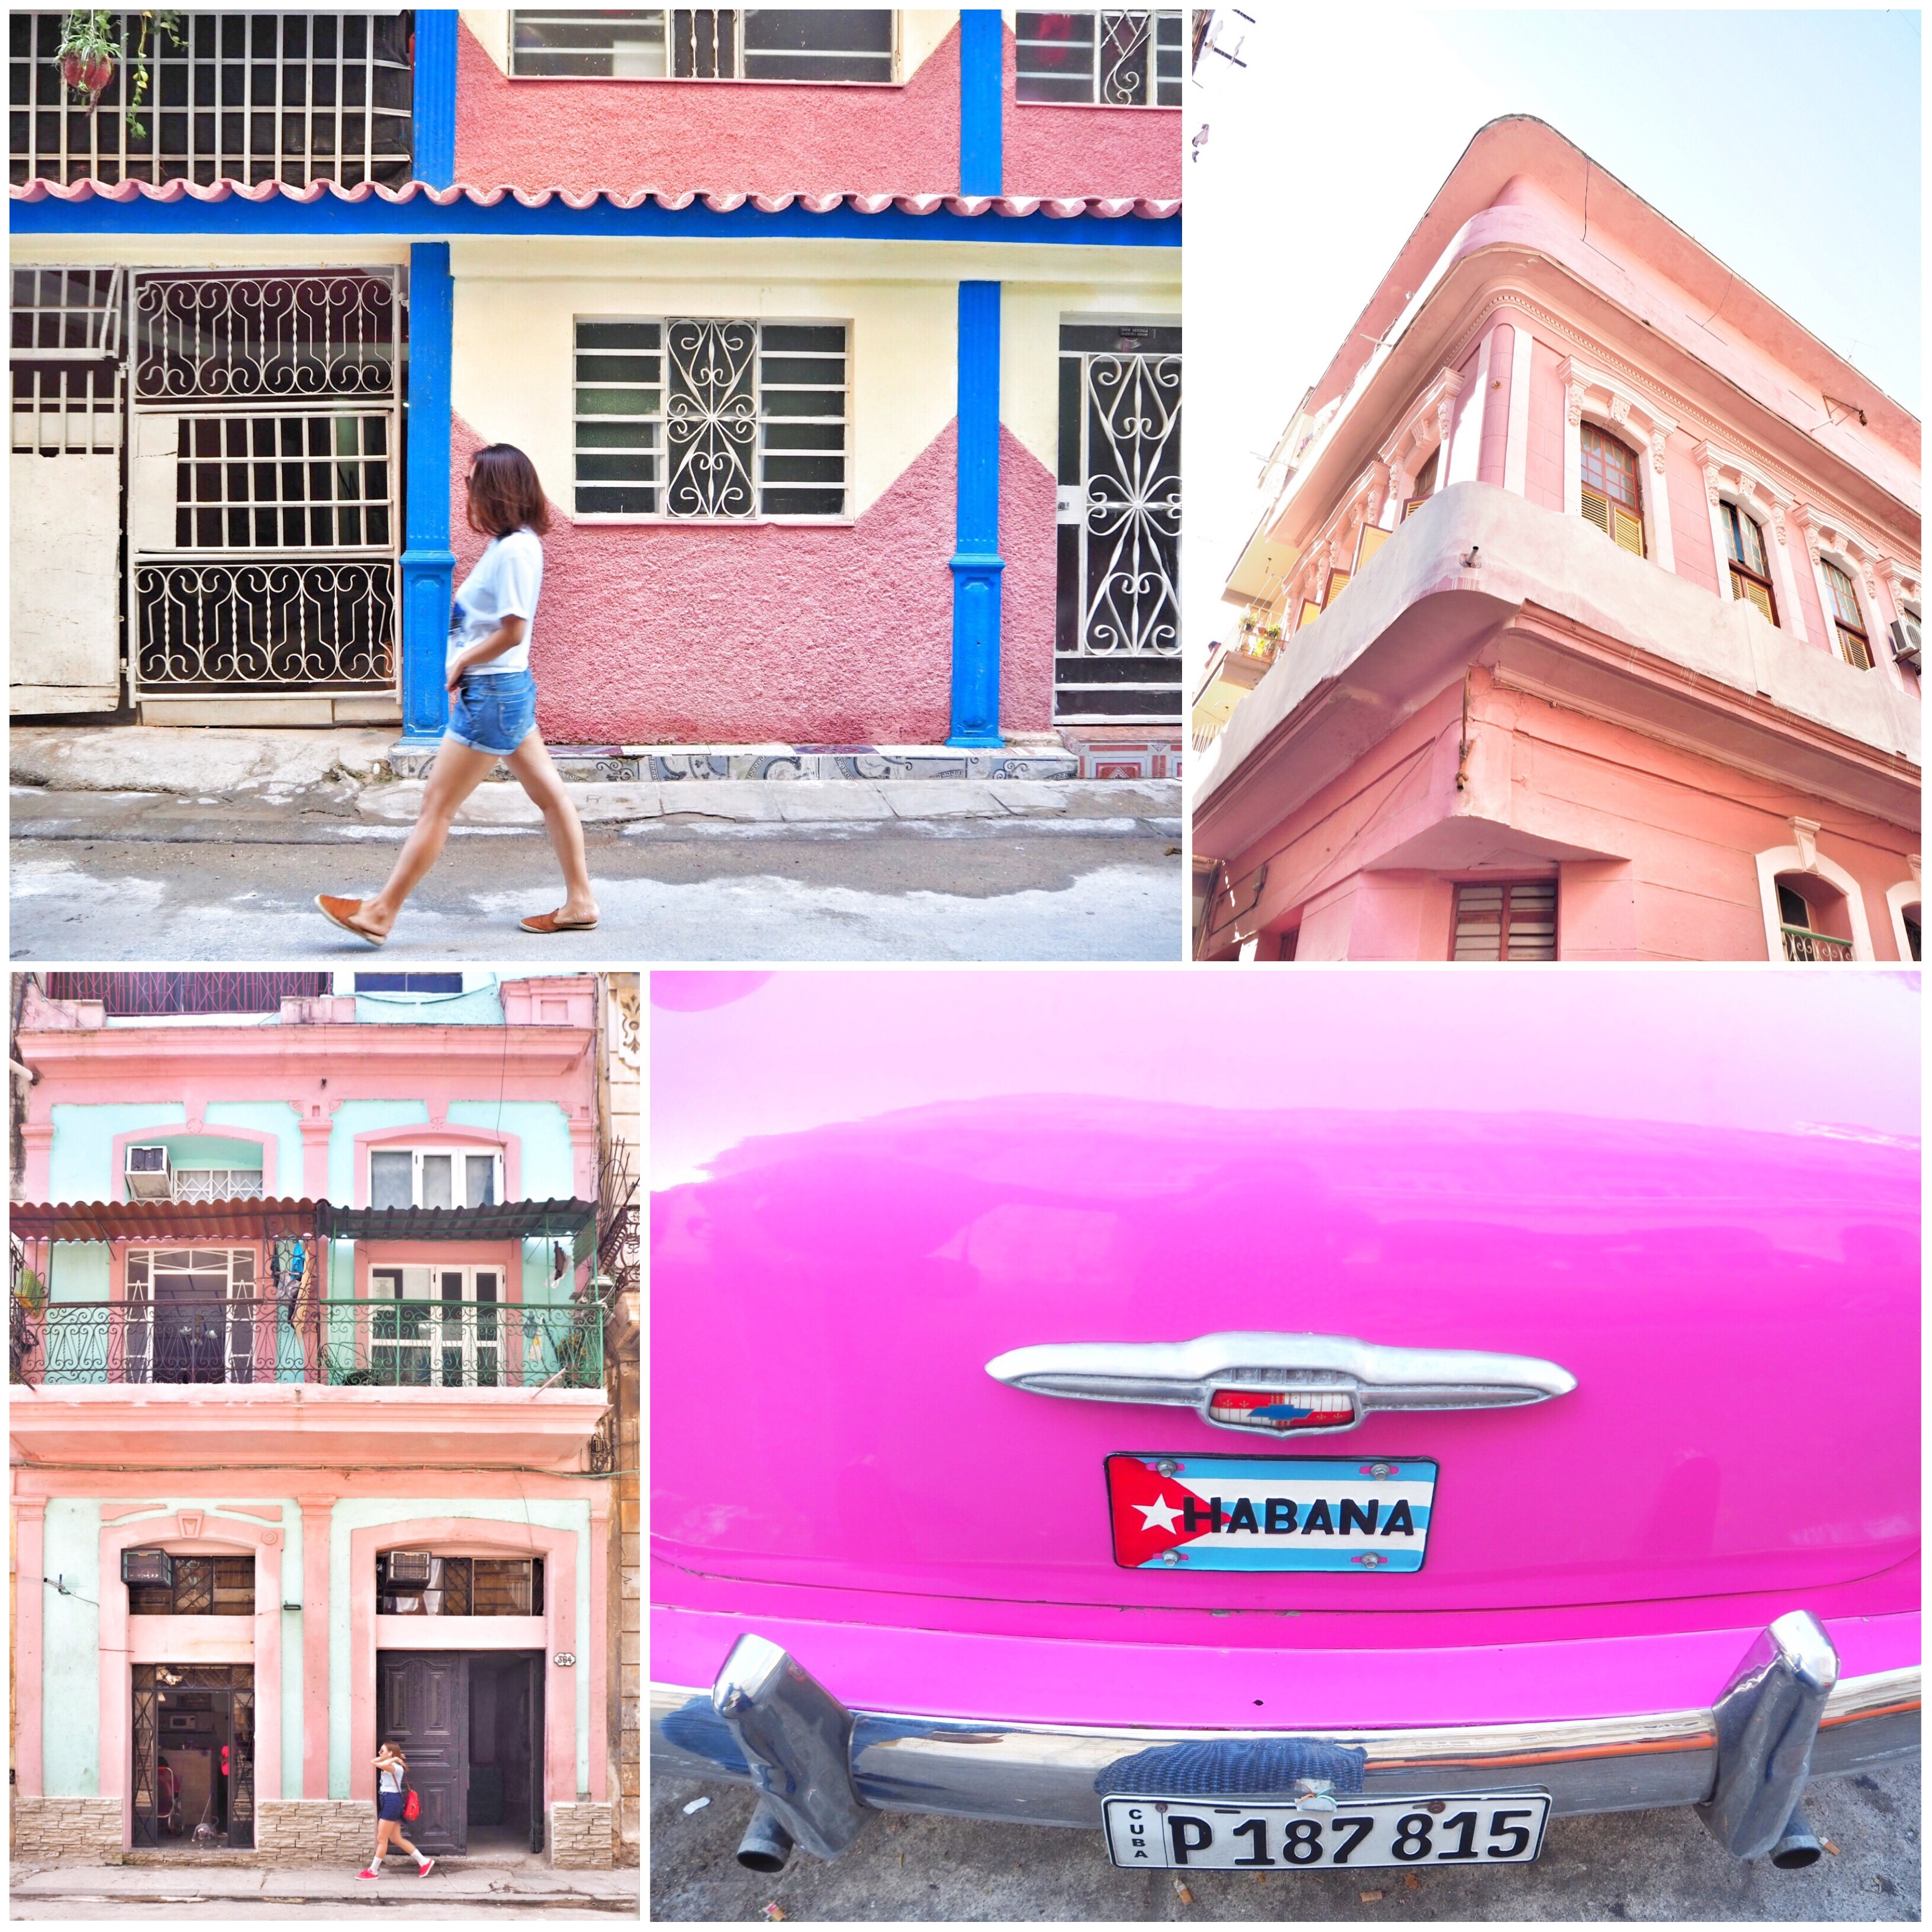 img 6742 - Old Habana - 街全体が世界遺産 色が溢れるハバナ旧市街散歩で出会った風景